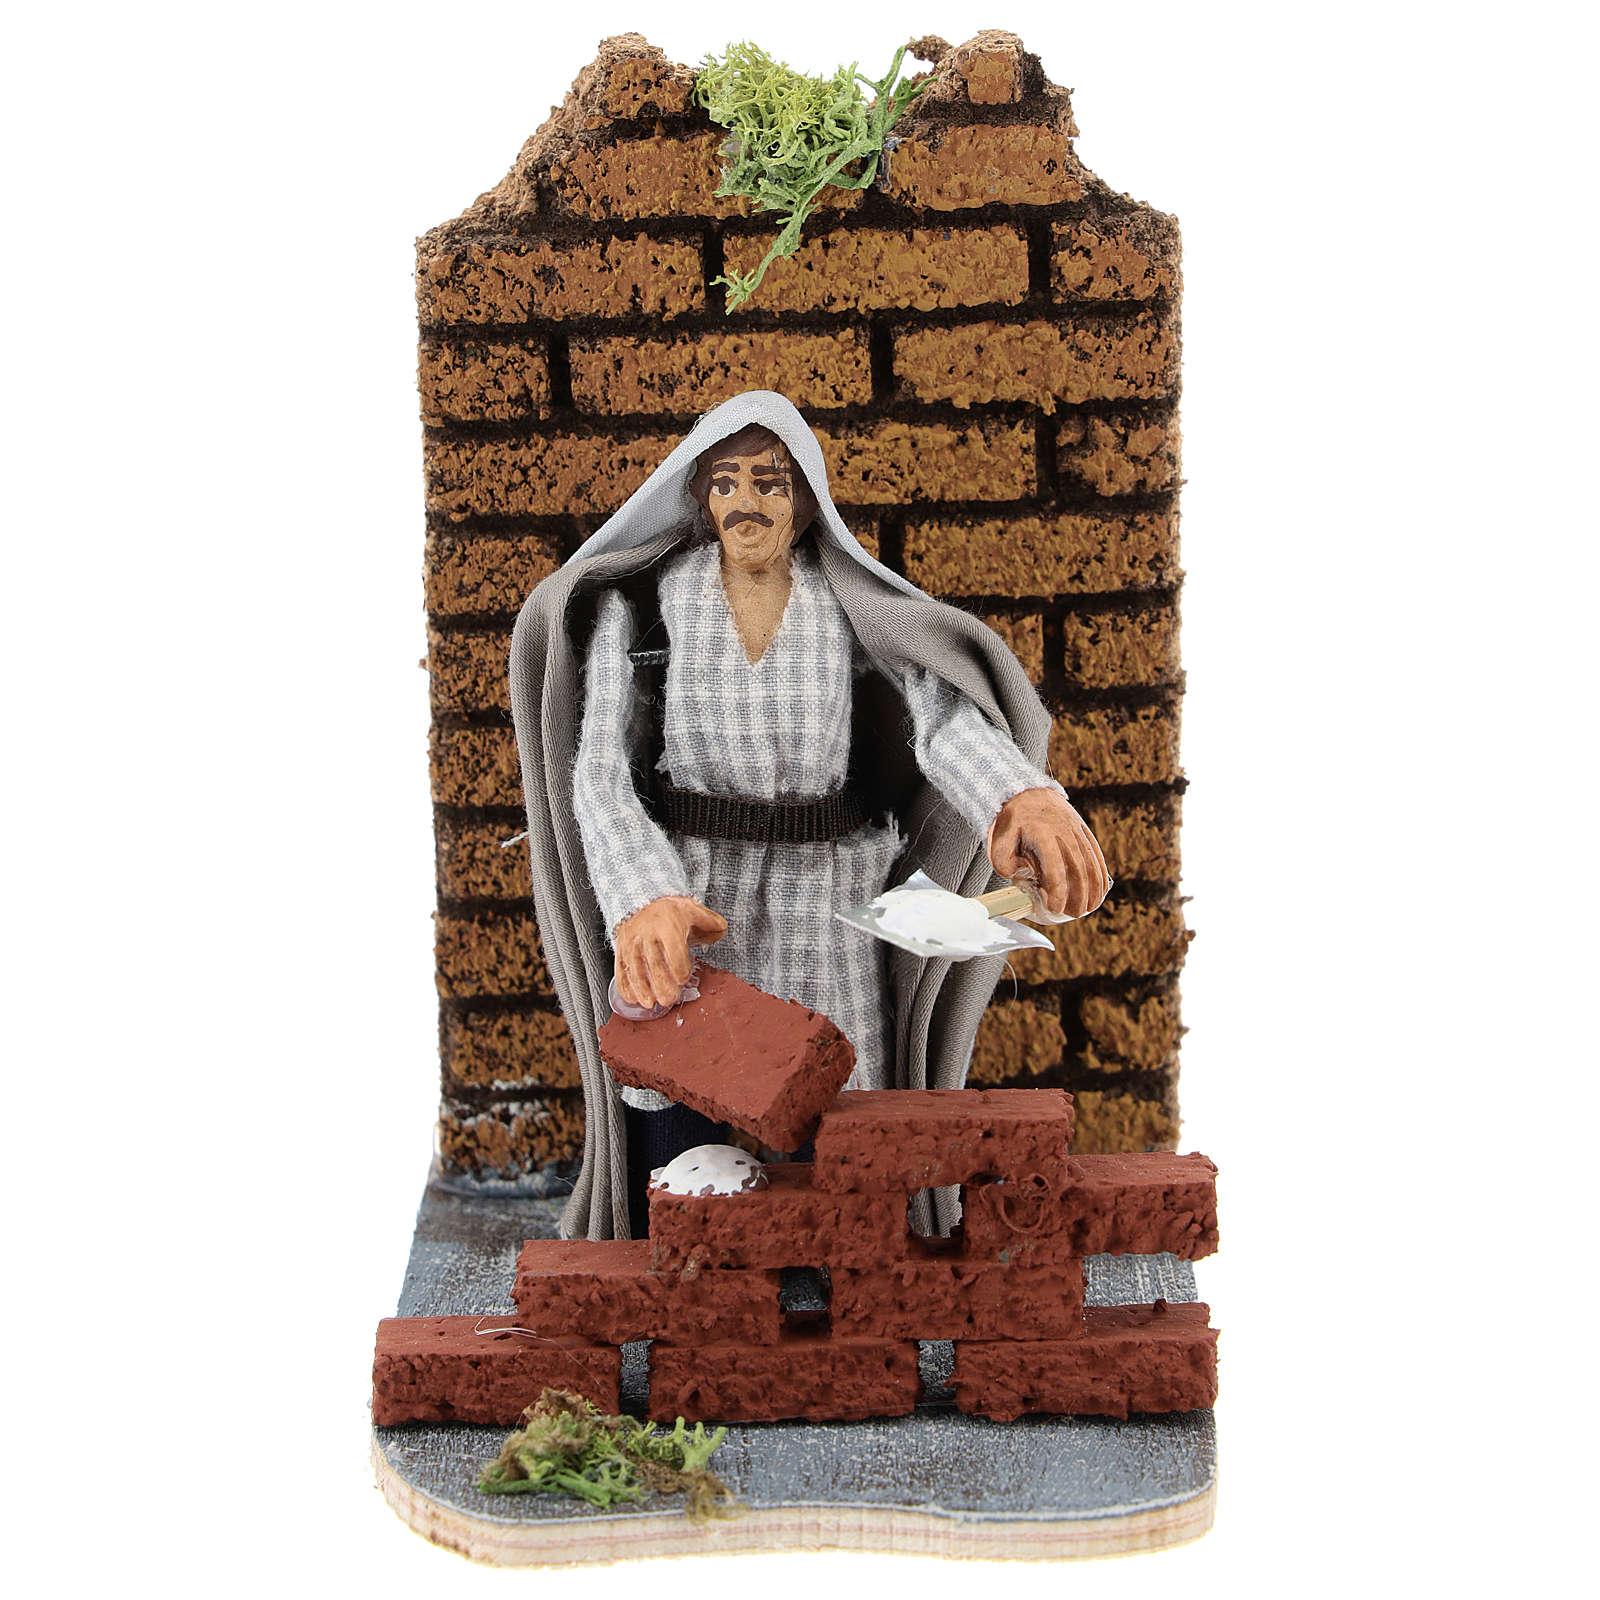 Moving mason for Neapolitan Nativity scene 7 cm 4